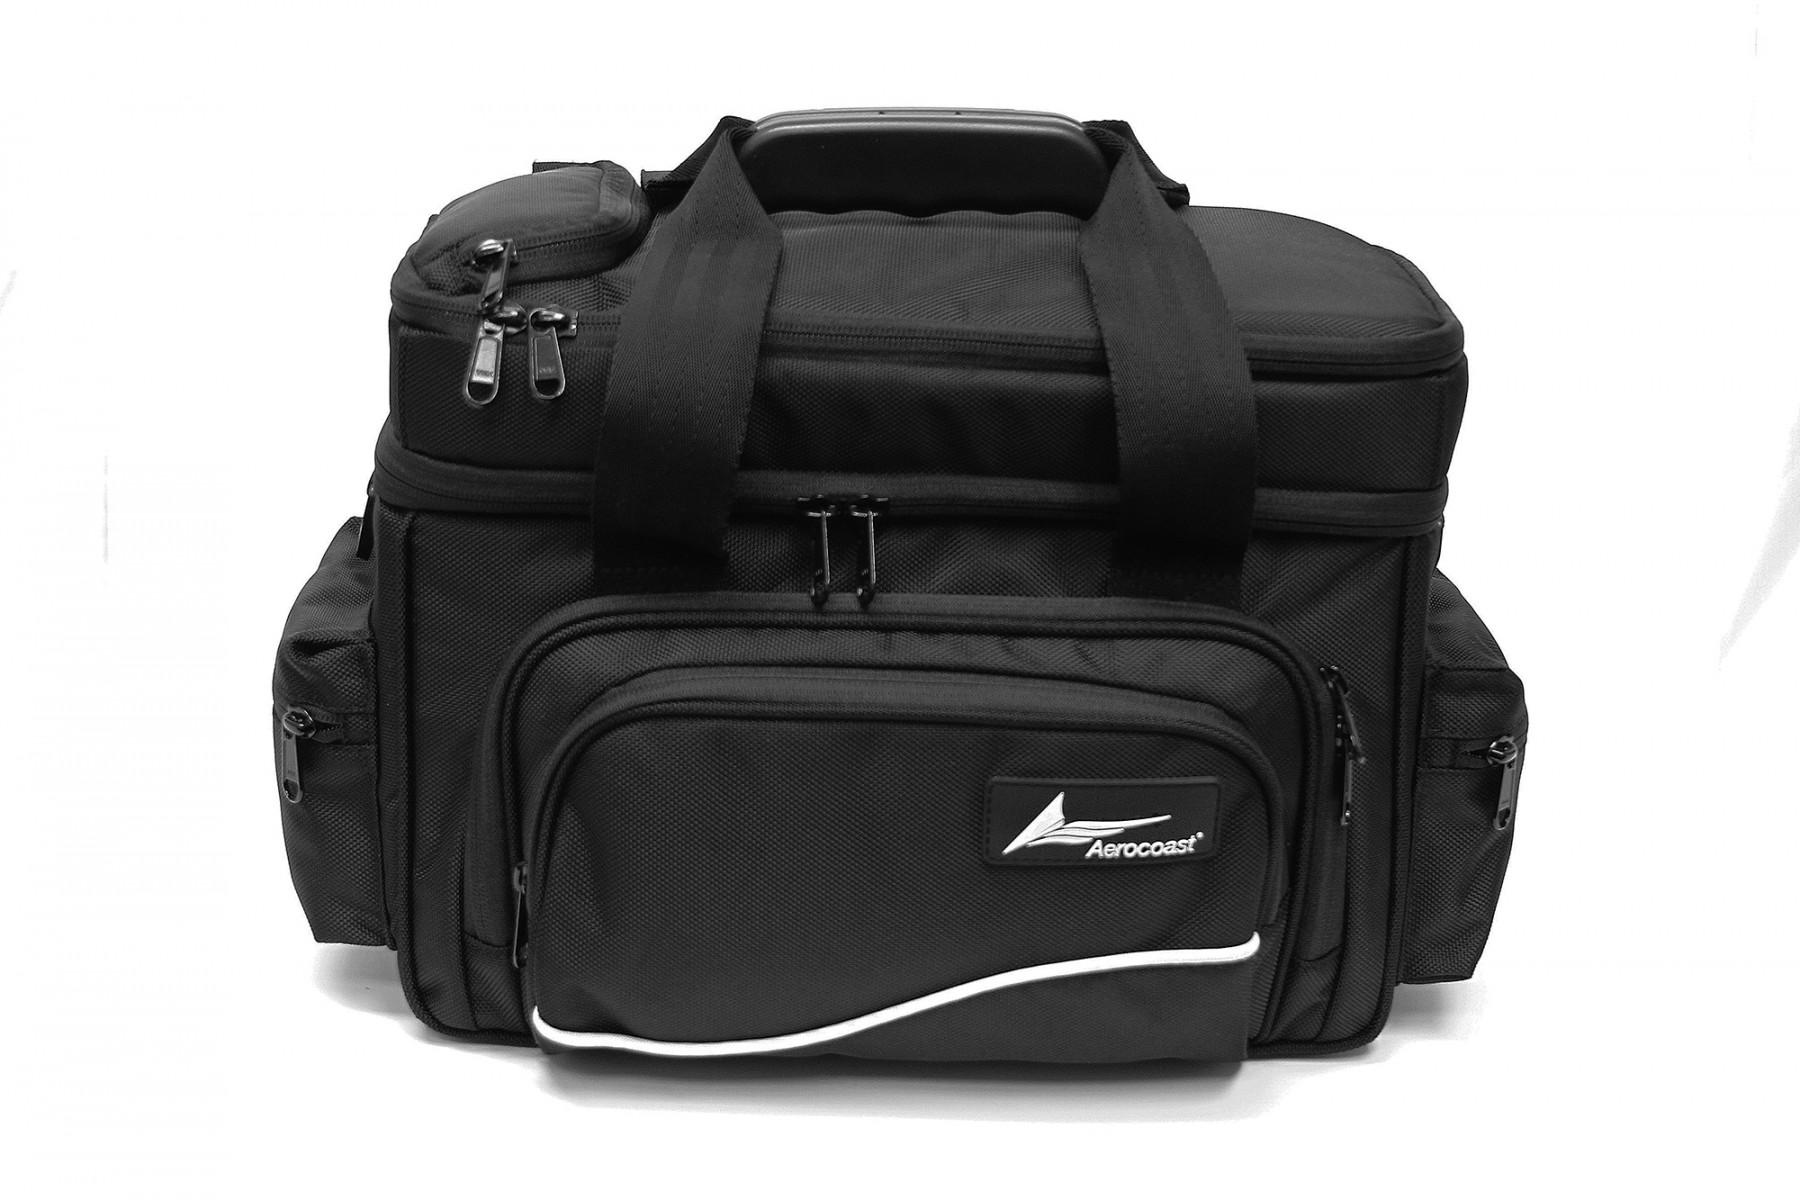 Aerocoast Pro Cooler I Bag Mypilotstore Com